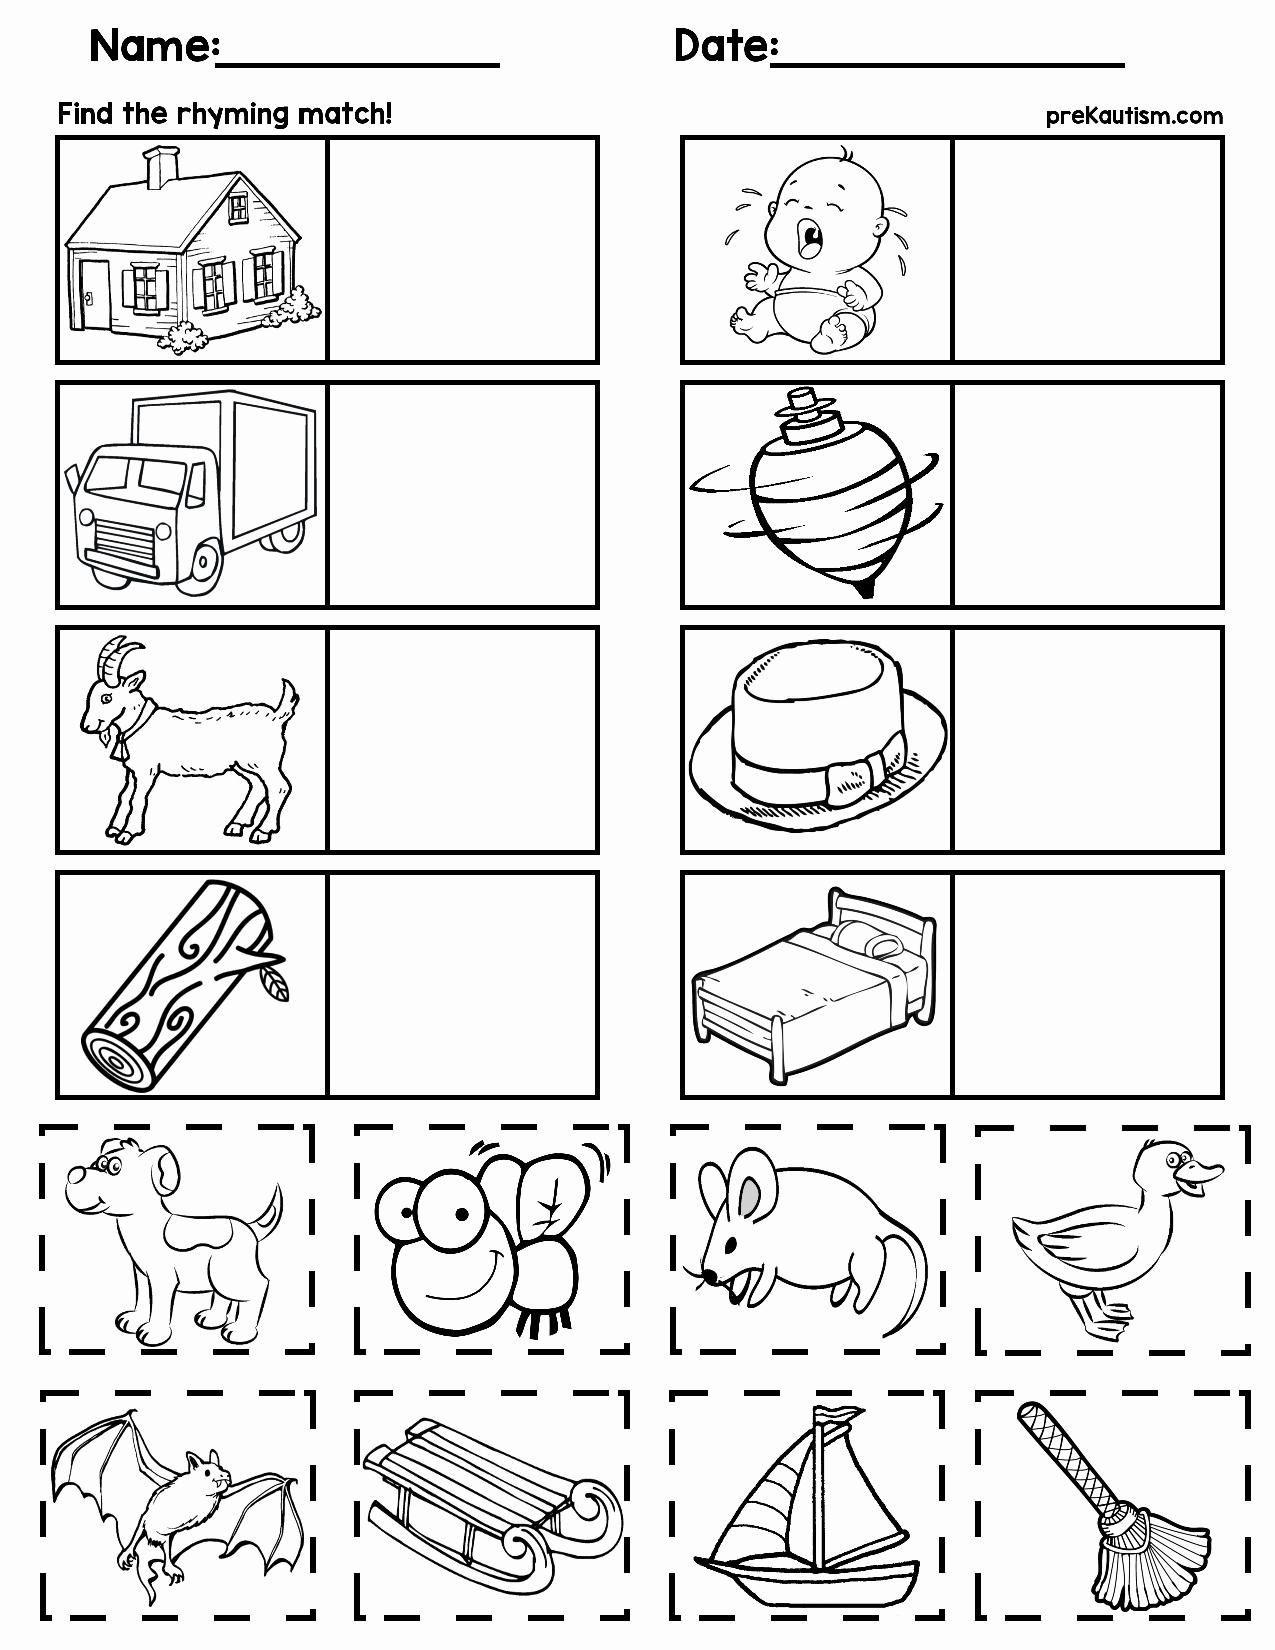 Rhyming Worksheets for Preschool Lovely Matching Rhyming Words